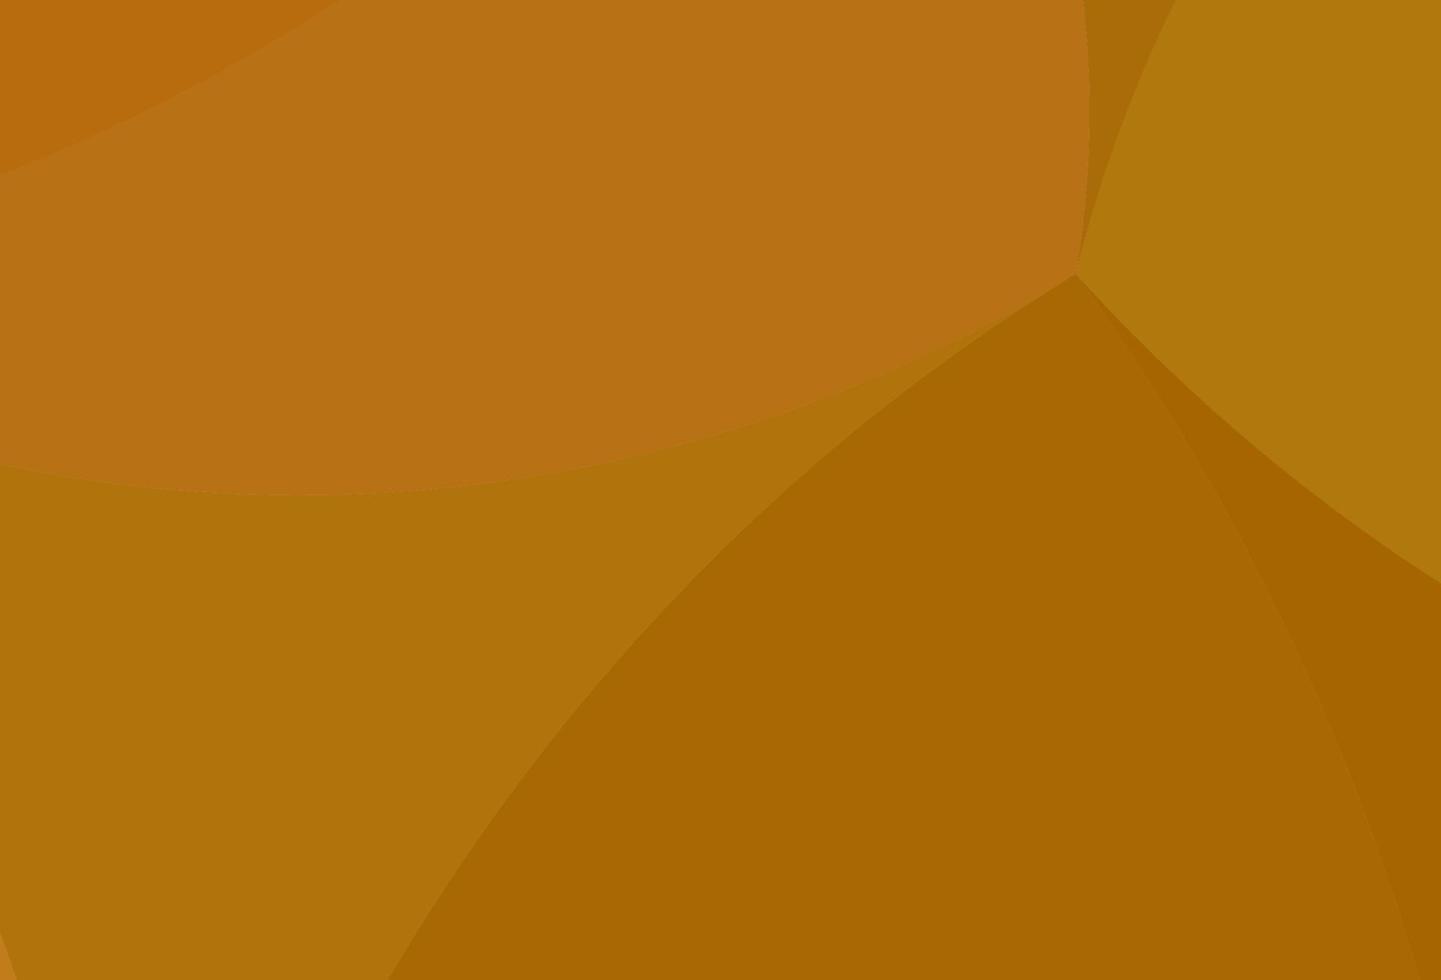 modelo de vetor laranja escuro com formas de bolha.